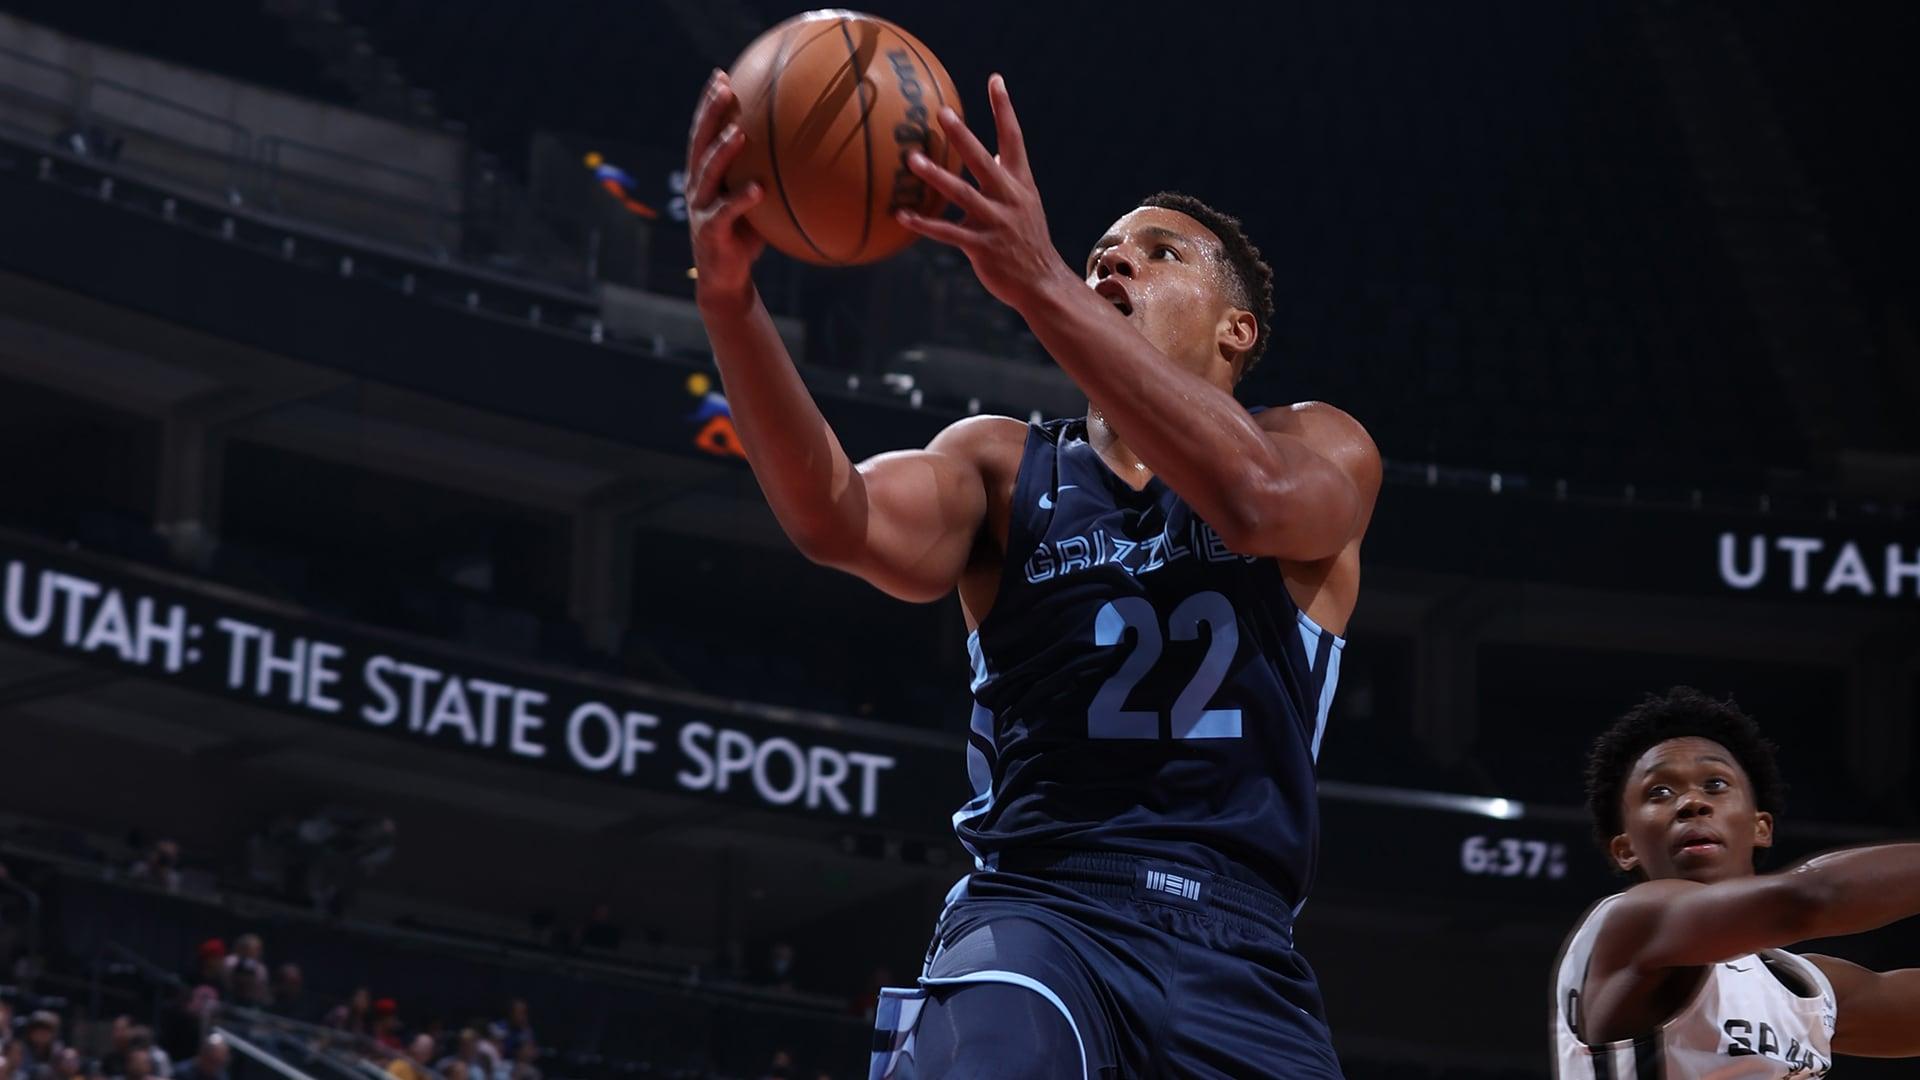 Salt Lake City Summer League: Bane, Grizzlies drop Spurs to spoil Vassell's big game